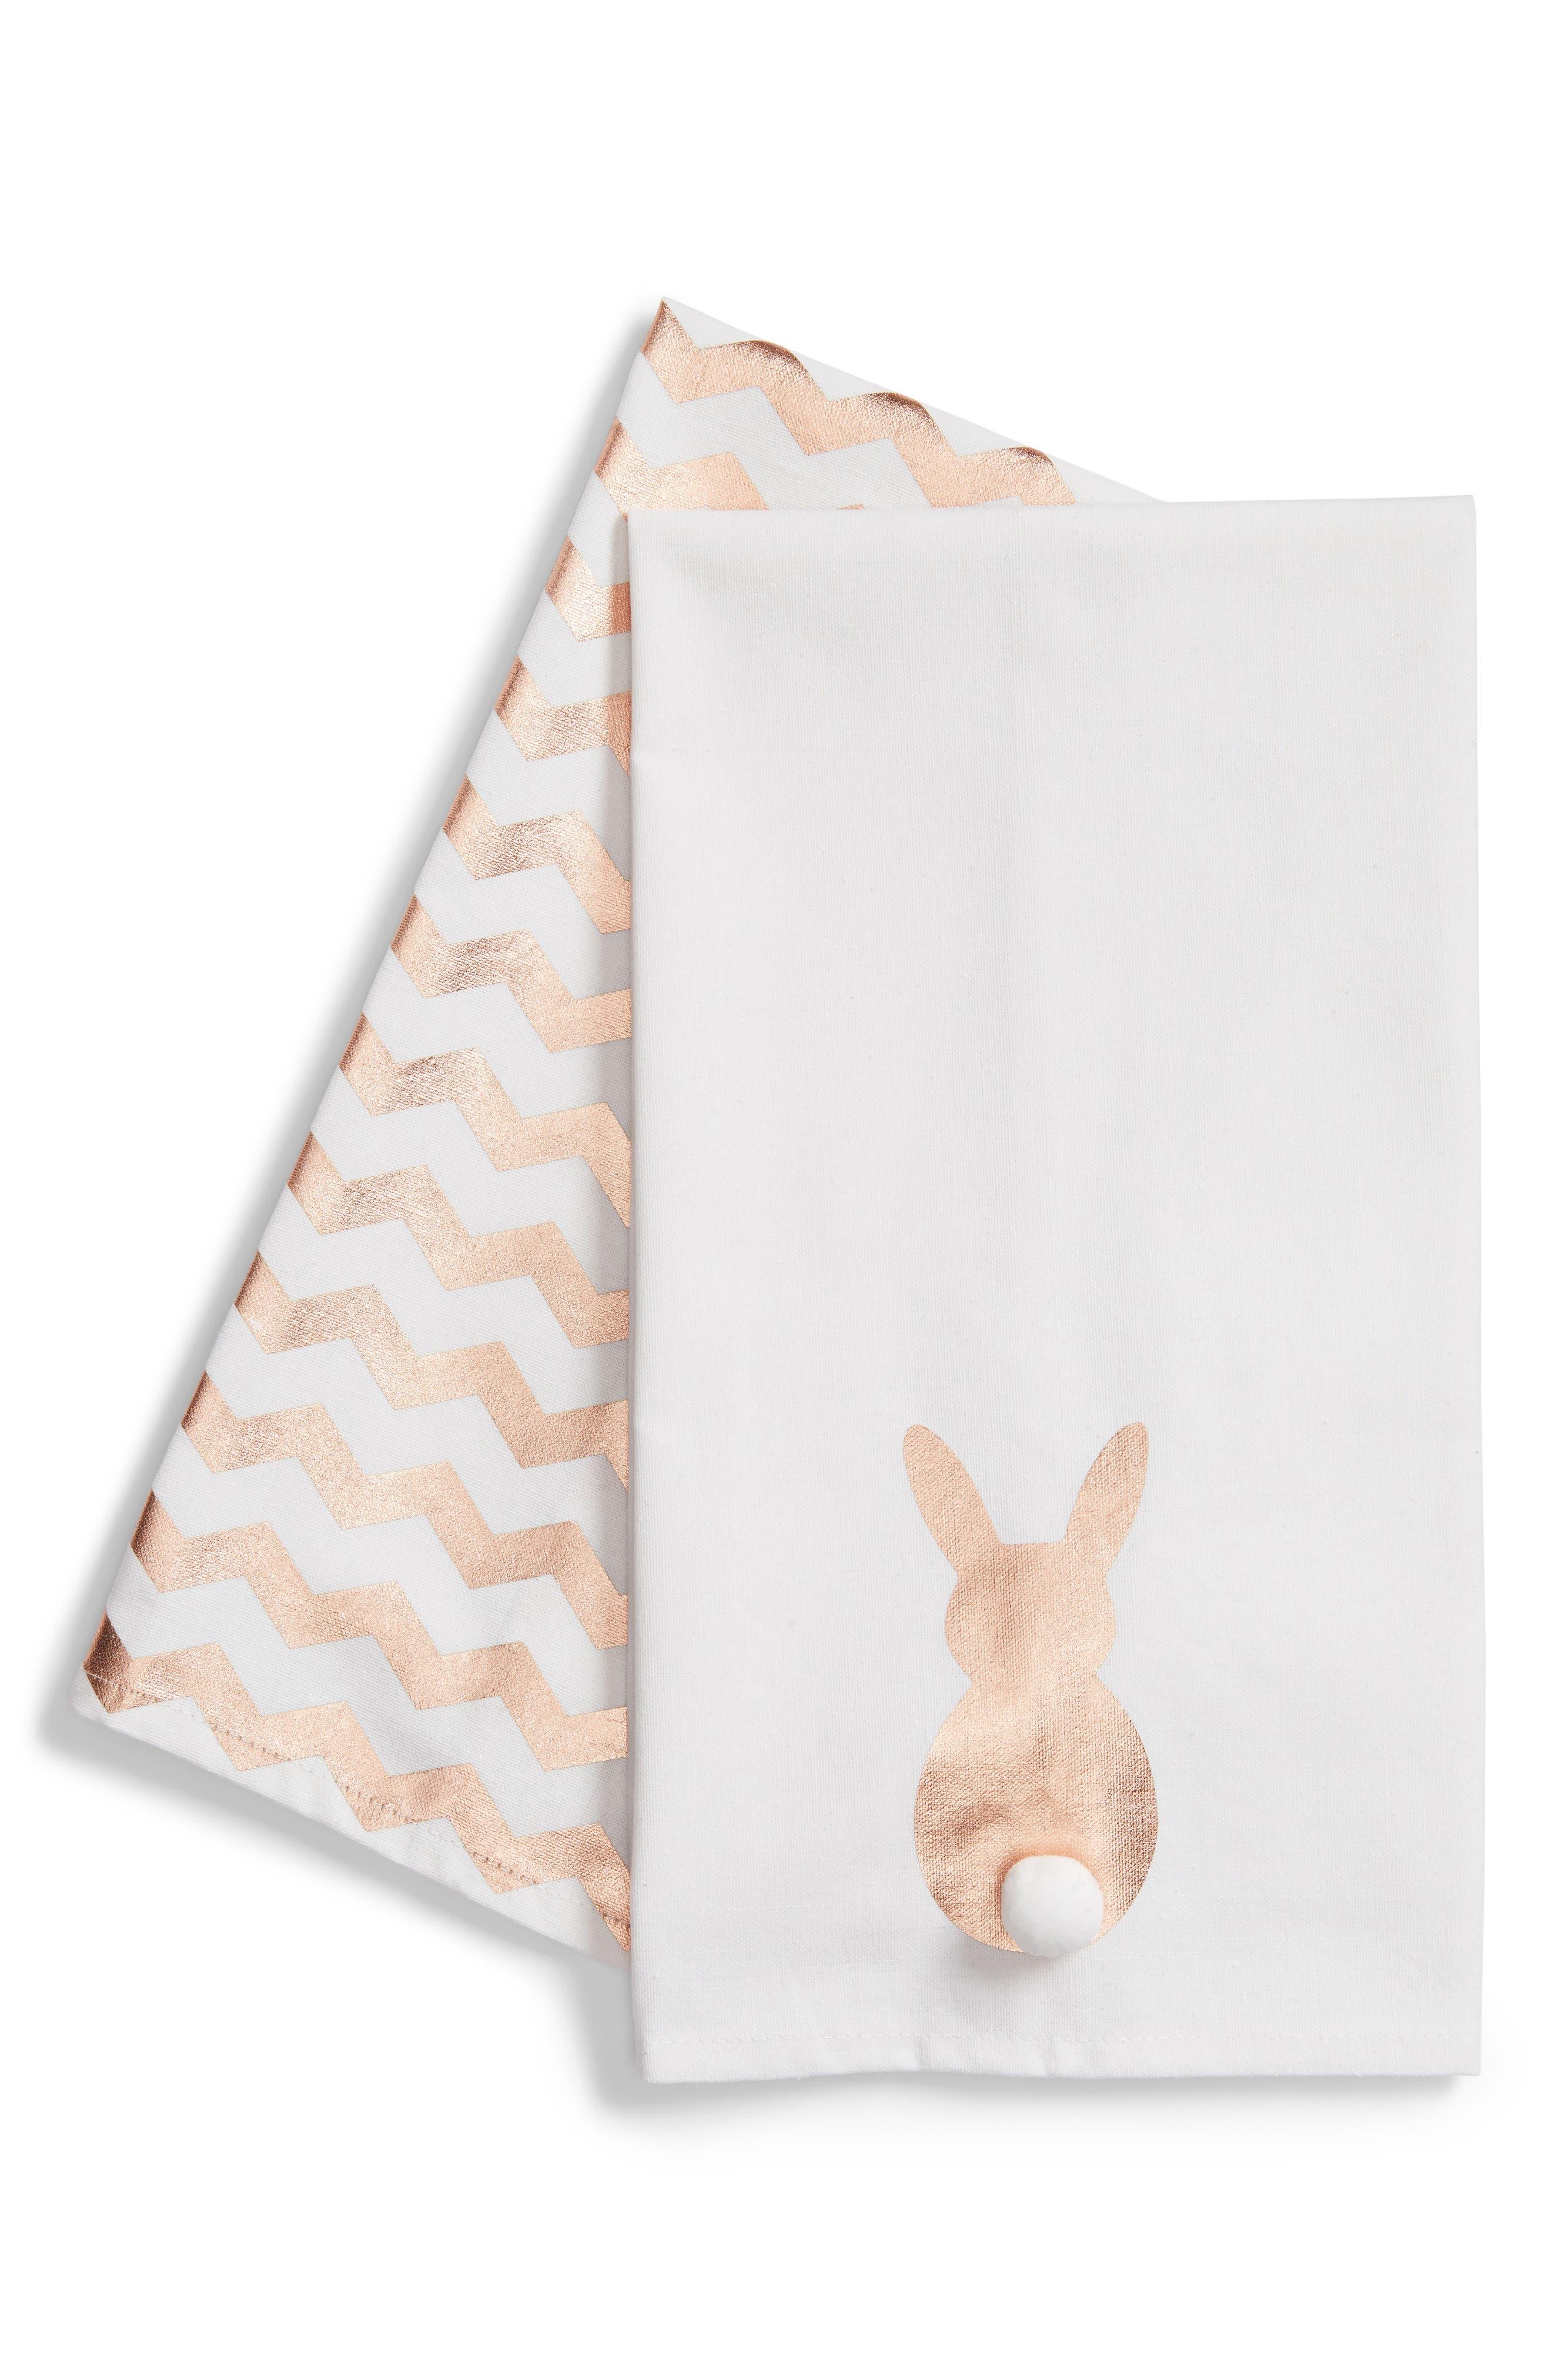 Bunny Set of 2 Dishtowels,                             Main thumbnail 1, color,